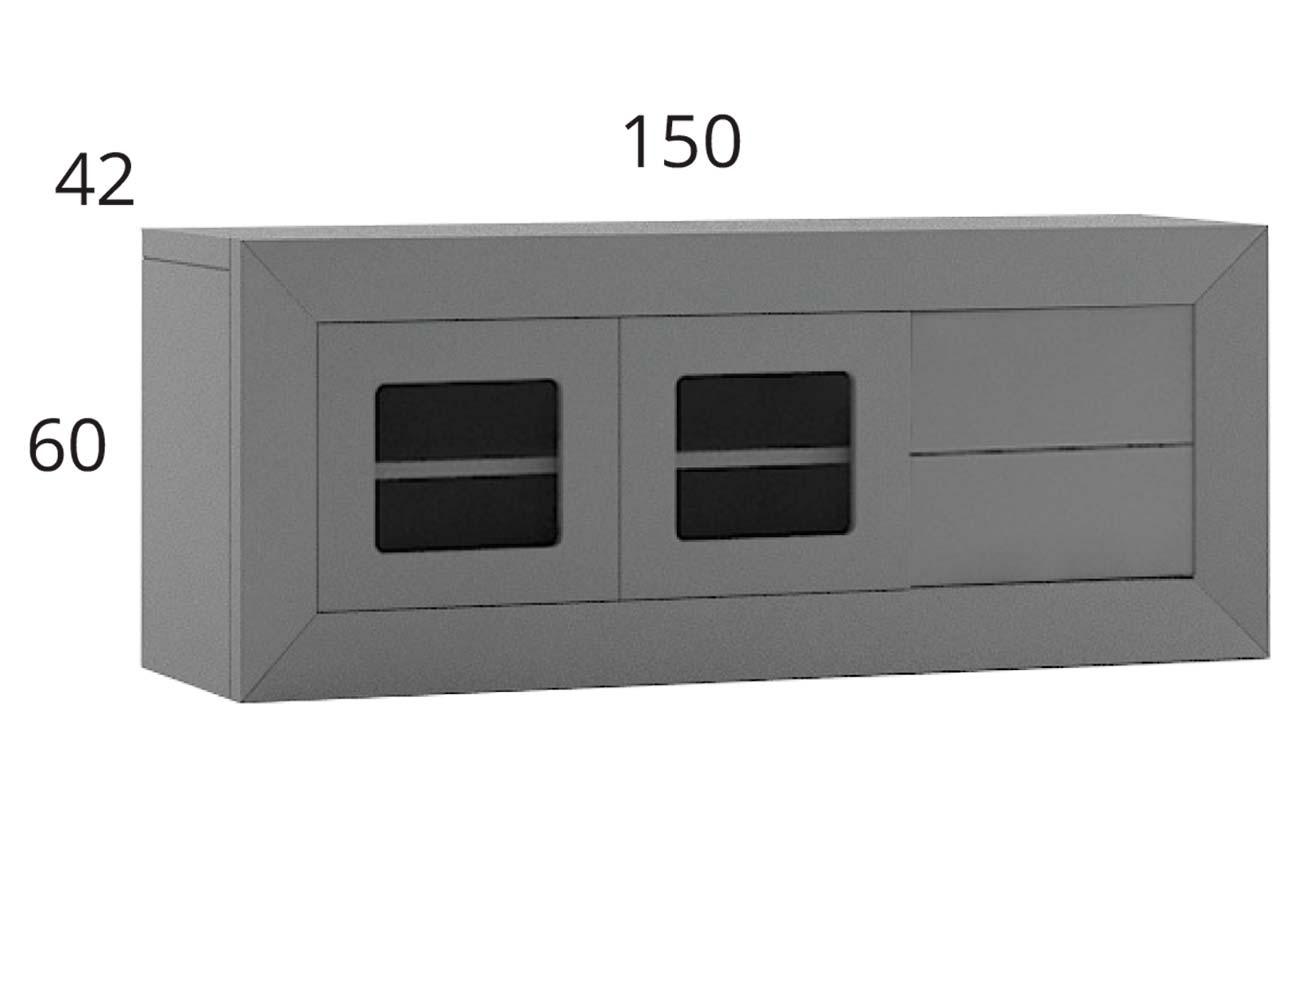 A0682